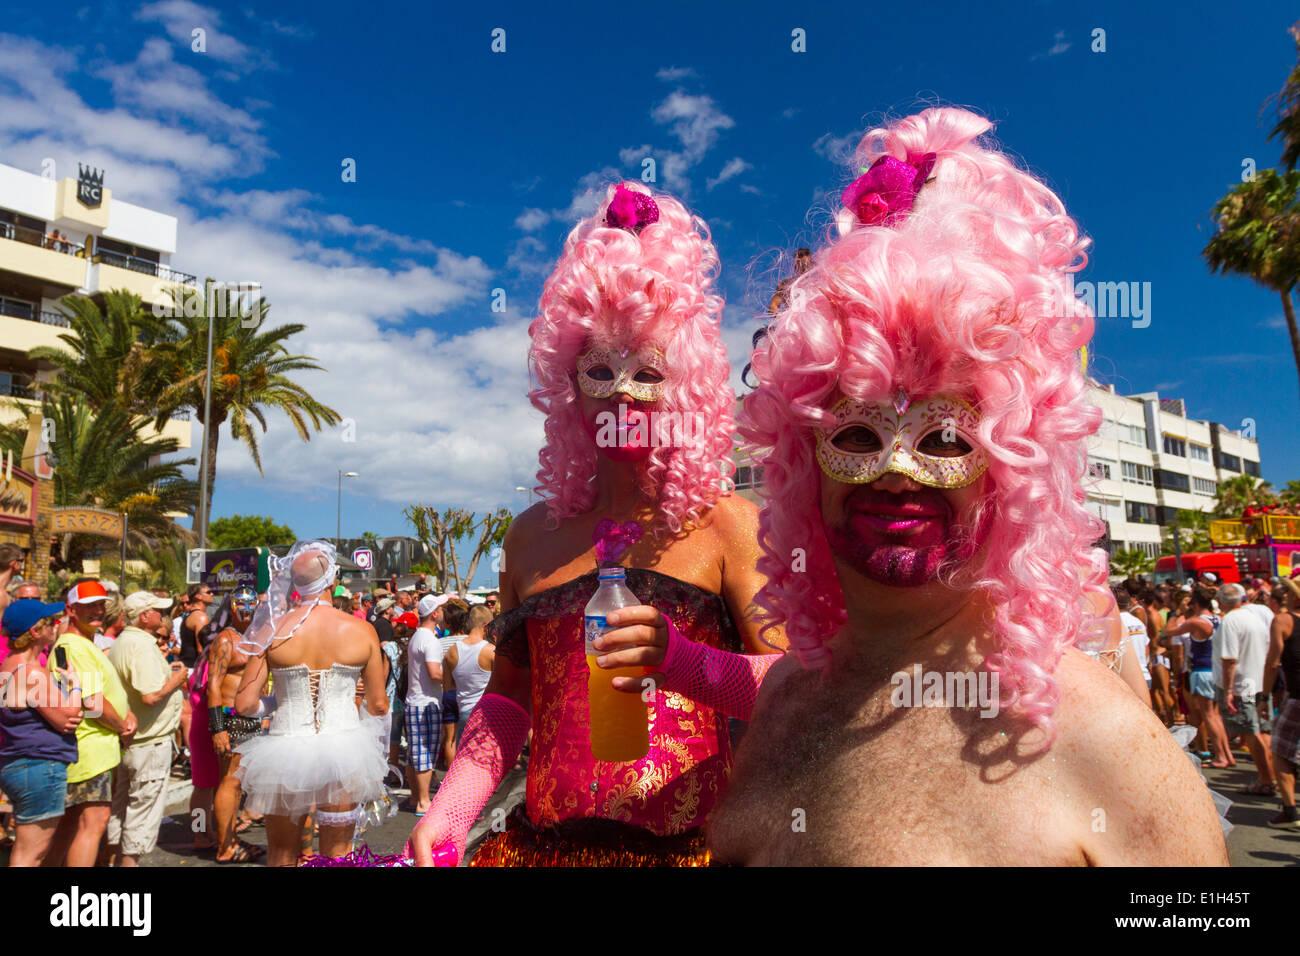 Gay Pride Parade Maspalomas 2014 Stockbild